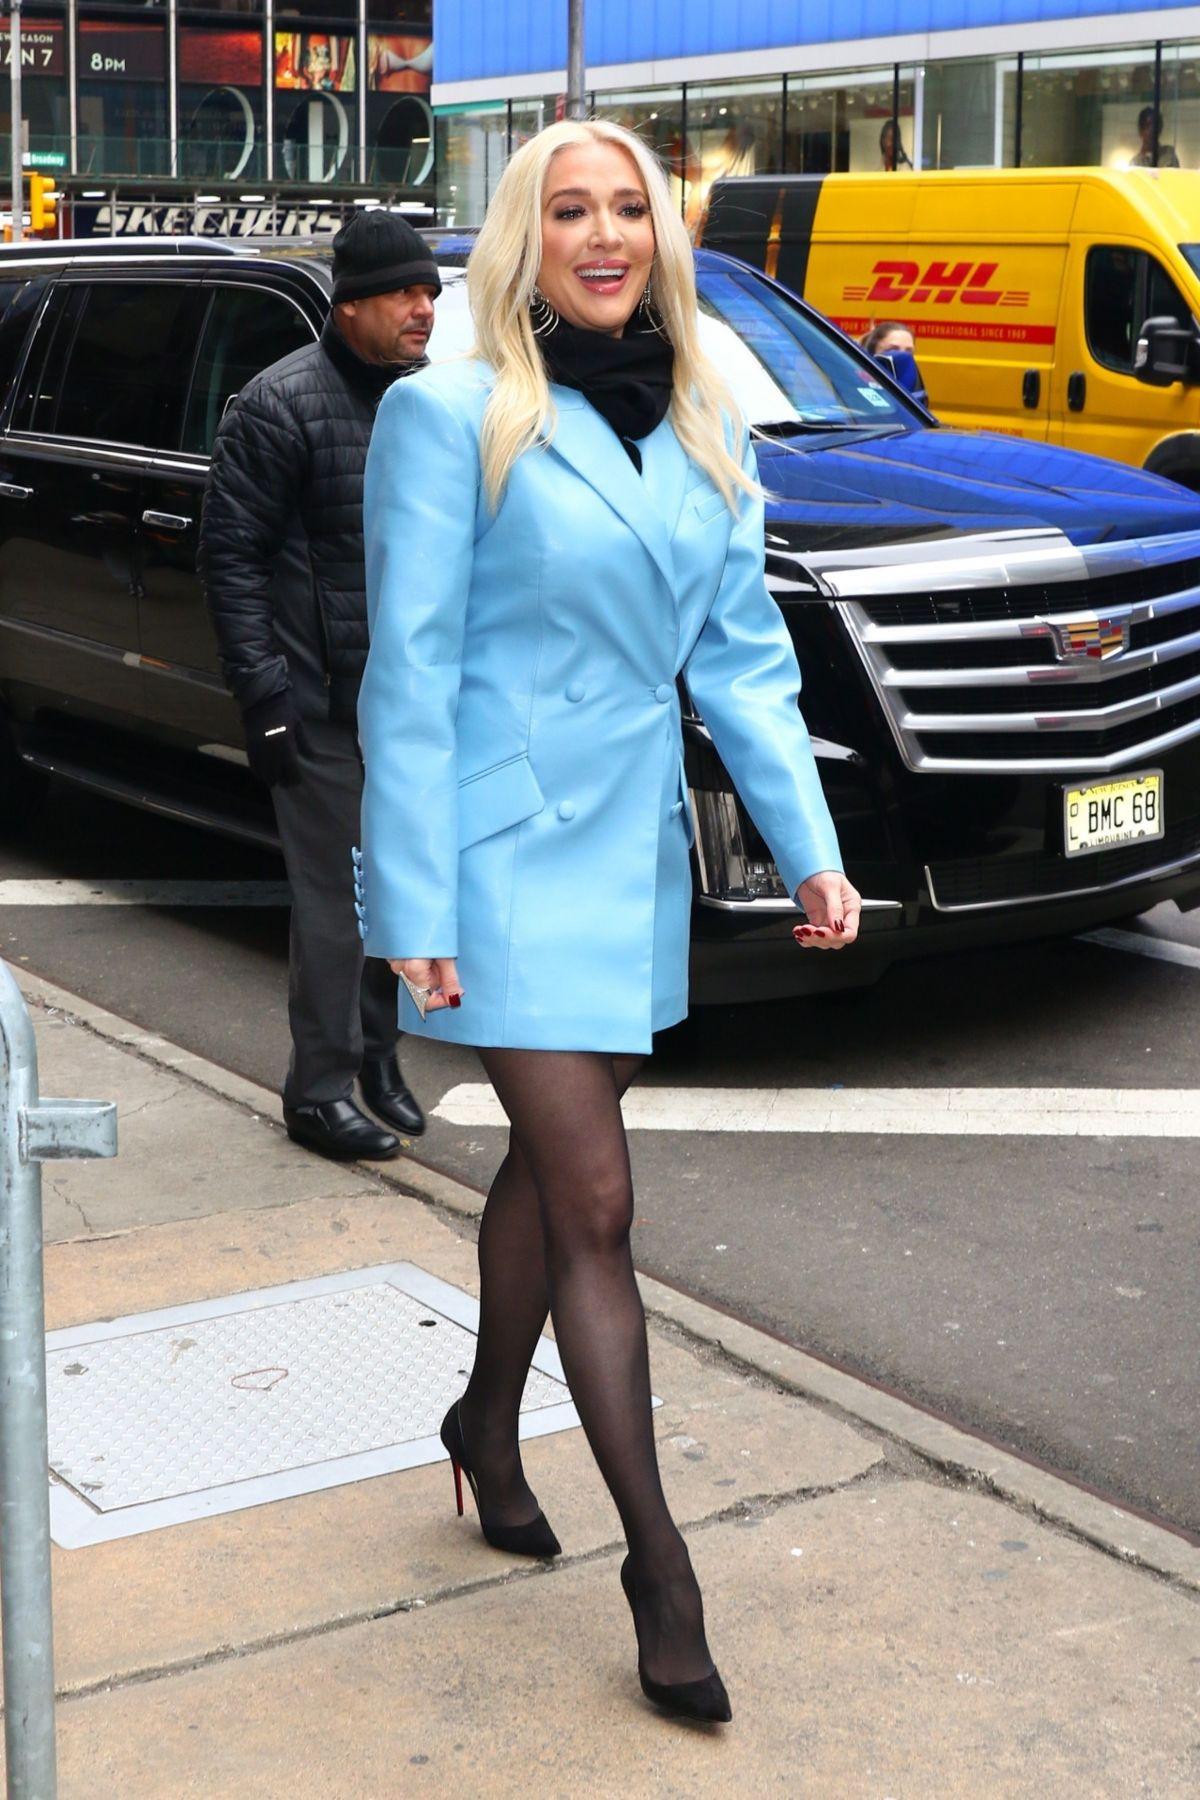 RHOBH Erika Jayne With Long Legs Looks Happy Amid Embezzlement Case!